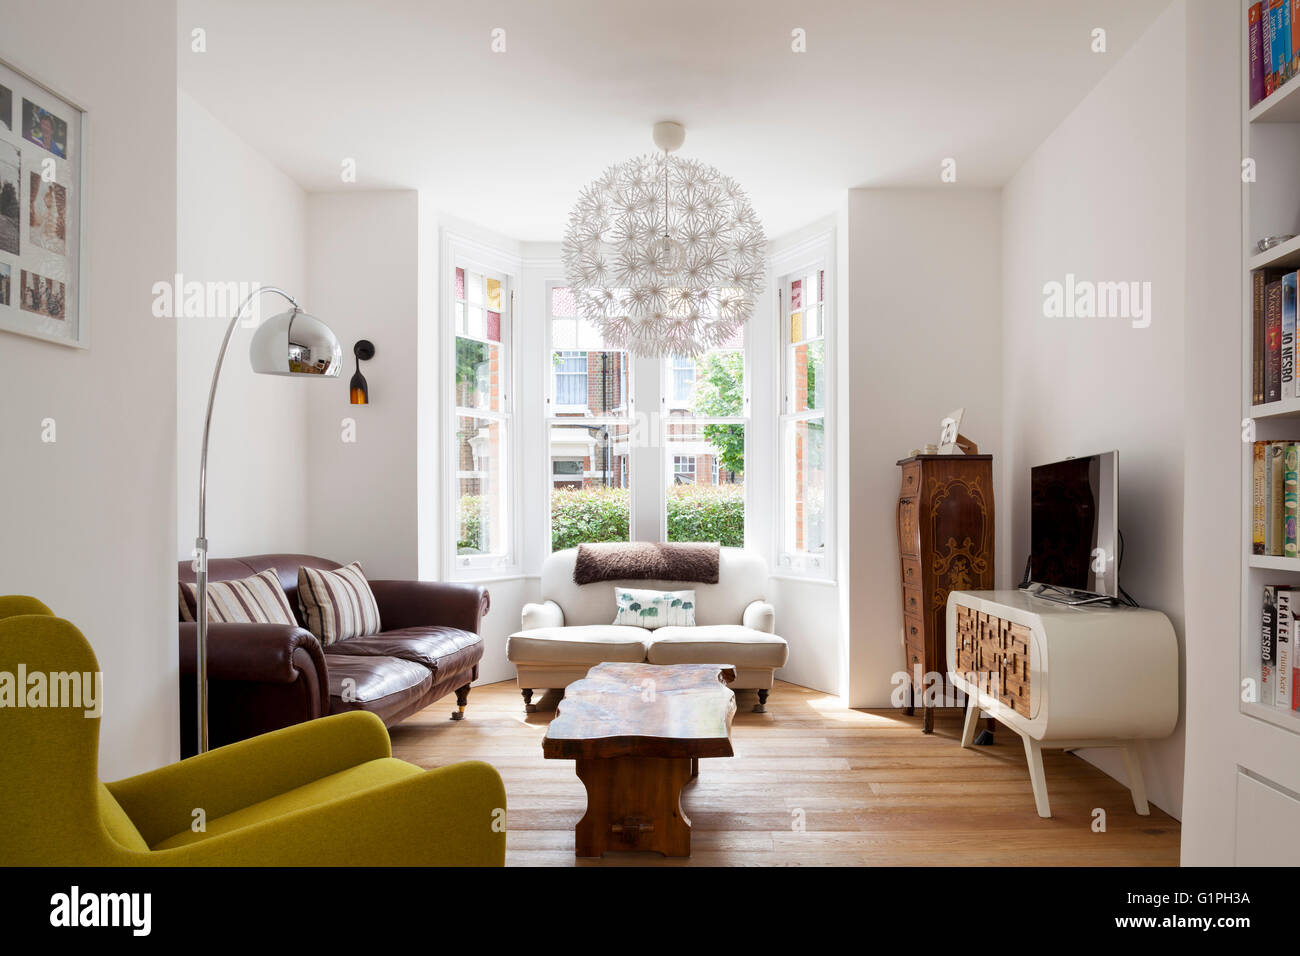 Wide shot of living room. Private House, London, United Kingdom. Architect: Scenario Architecture, 2016. - Stock Image